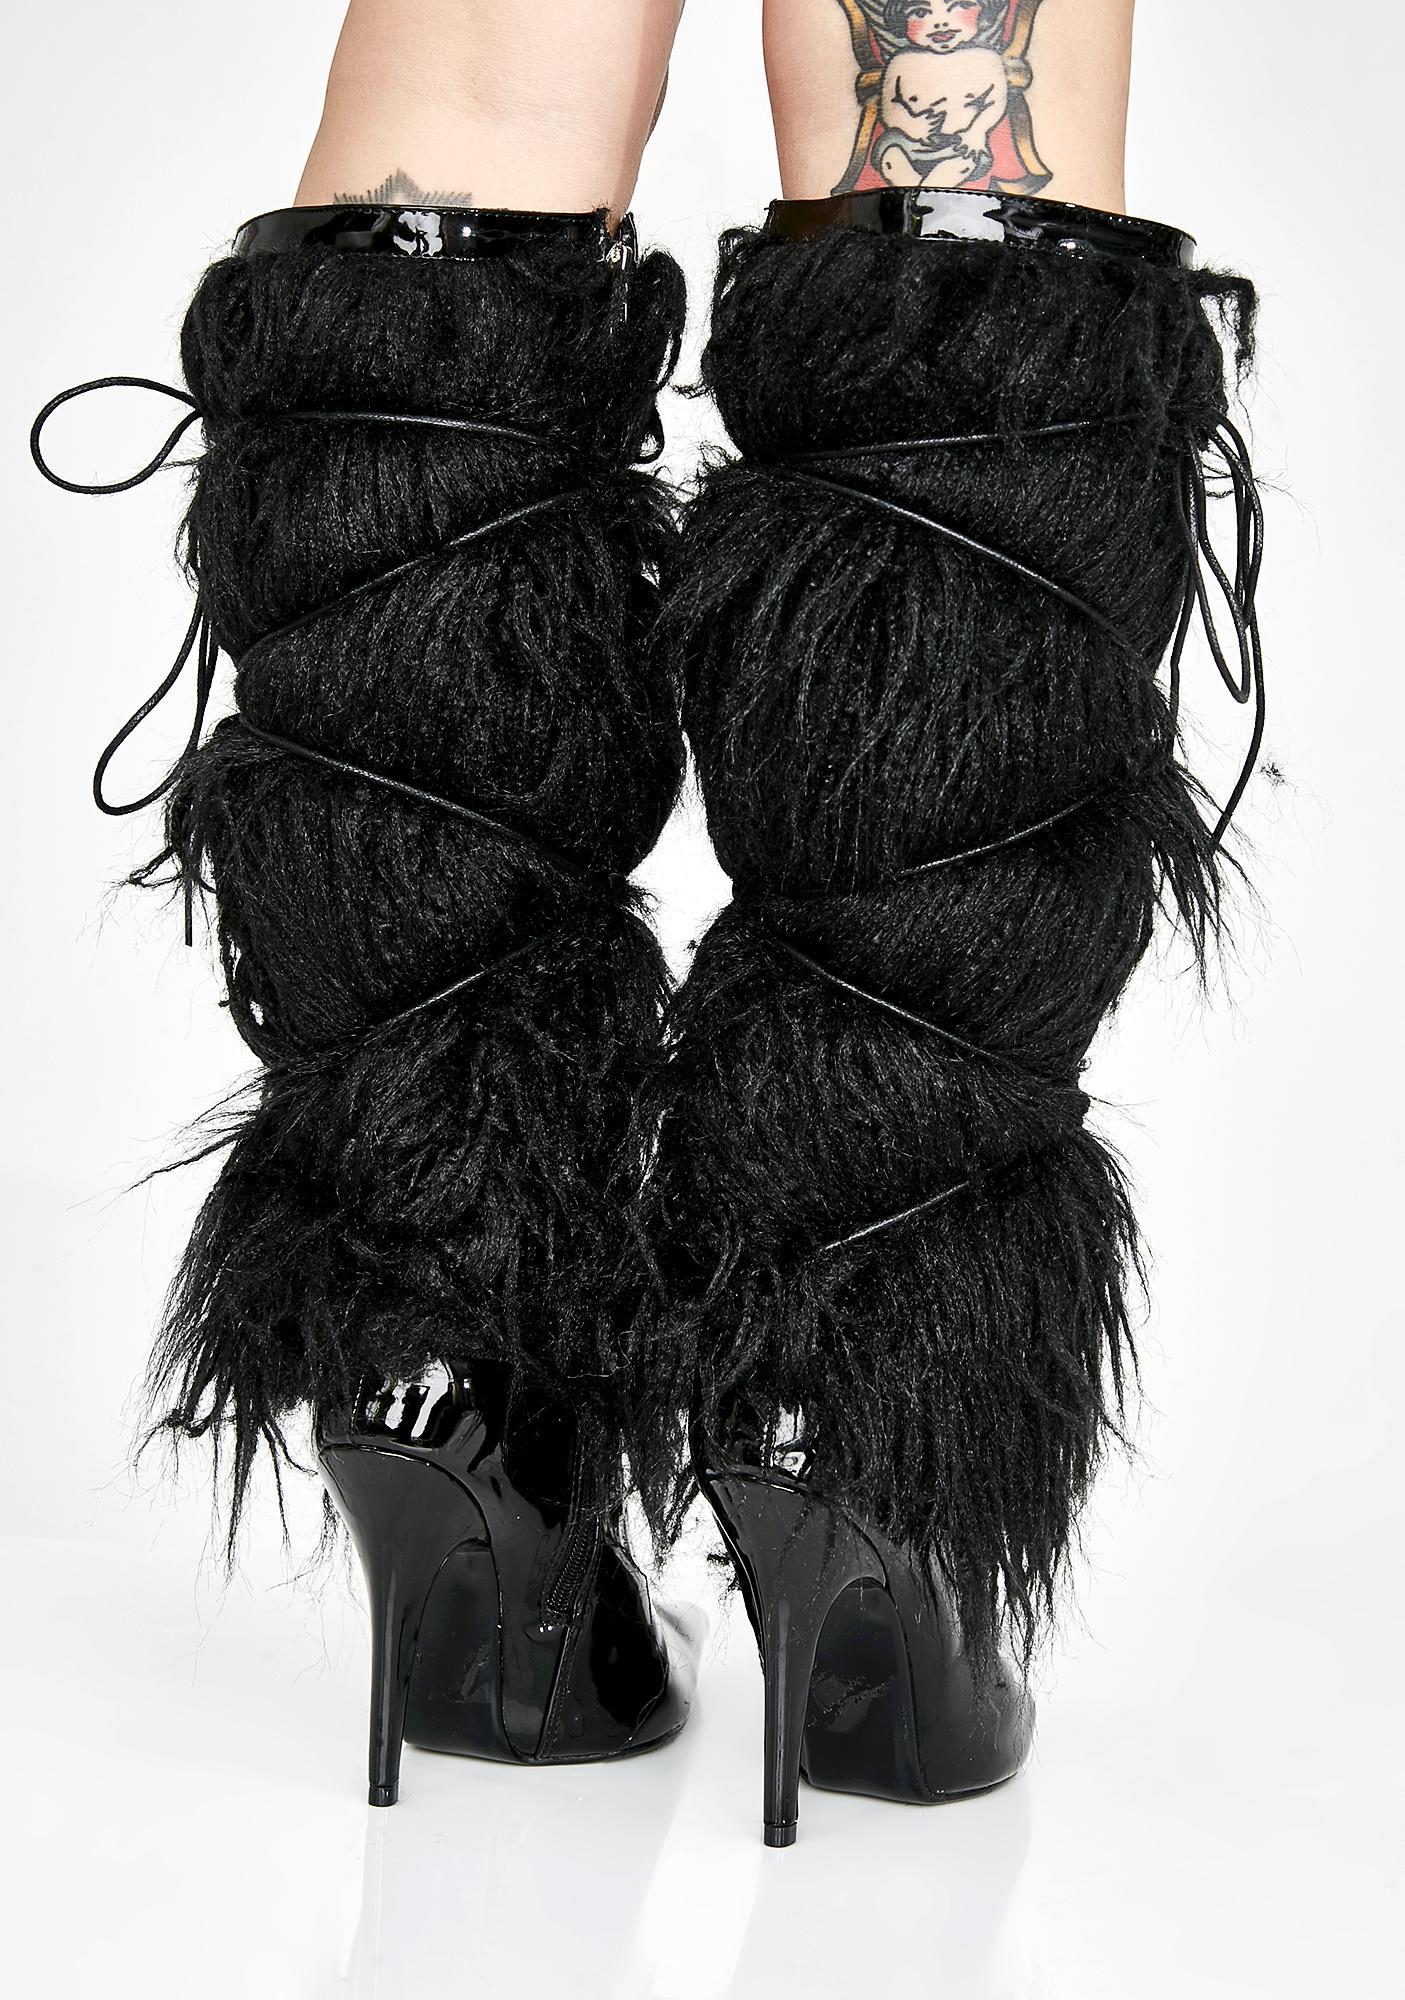 Diva Hustle Fuzzy Boots